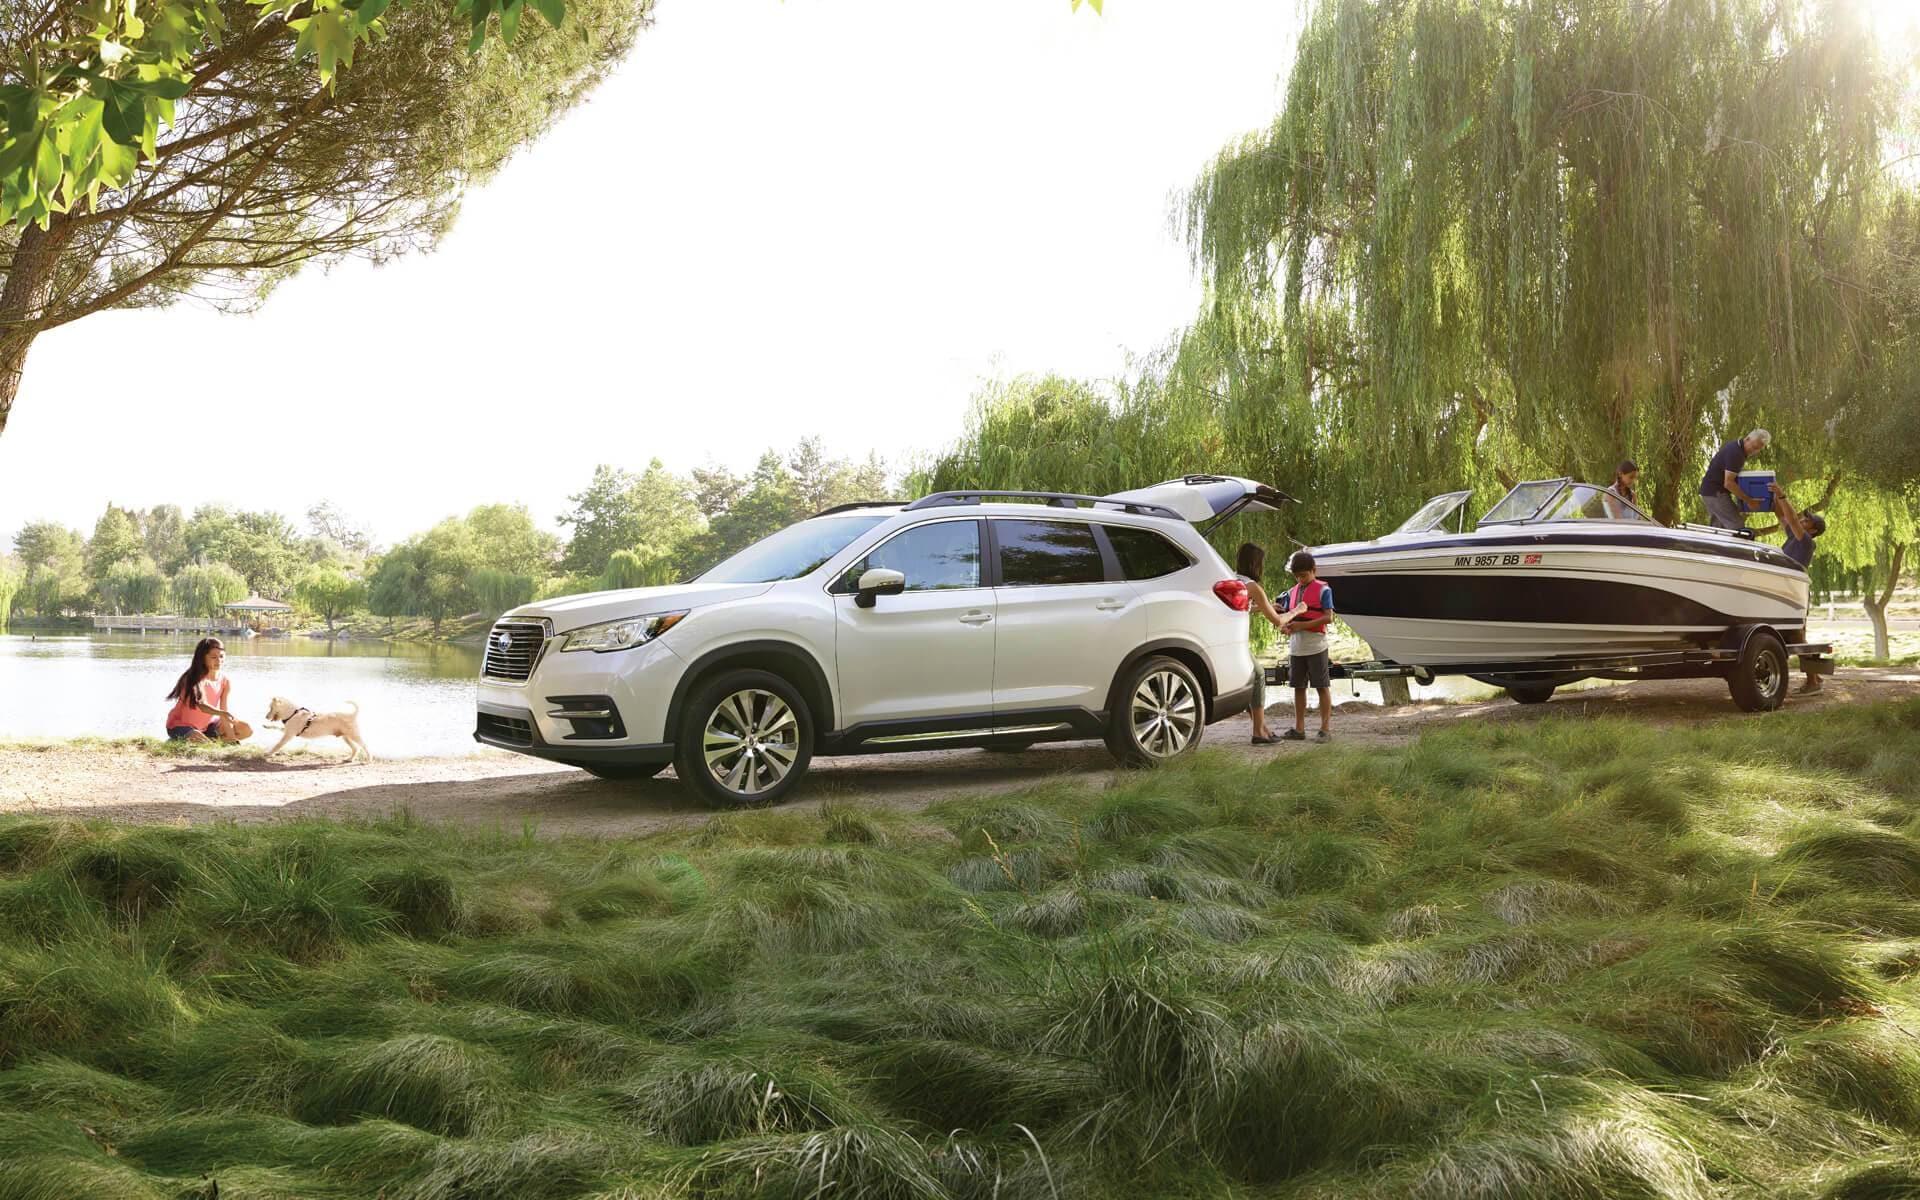 2019 Subaru Ascent SUV for Sale in Staten Island New York